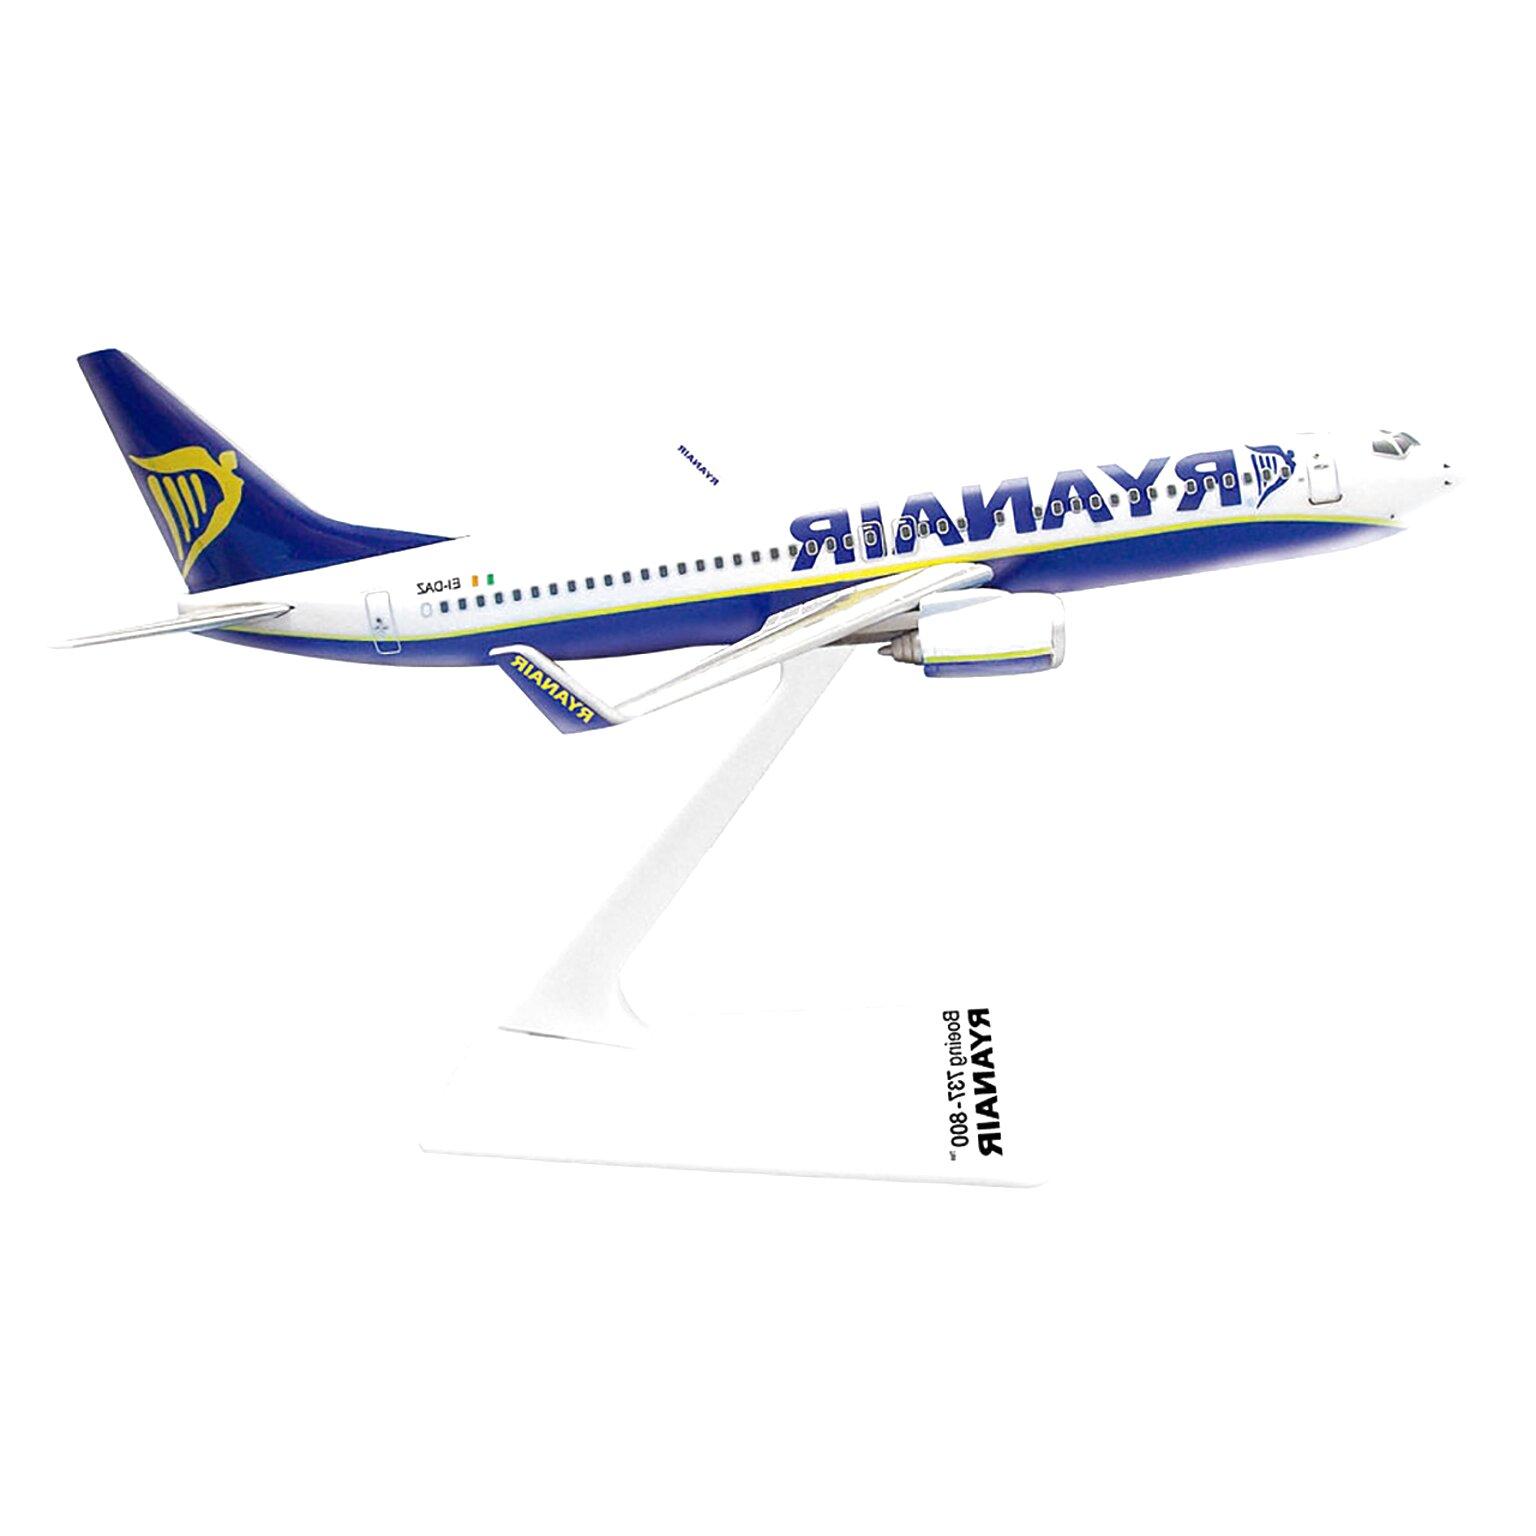 Premier Portfolio Thomson Airways Fun Plane with Sound /& Lights New /& Boxed